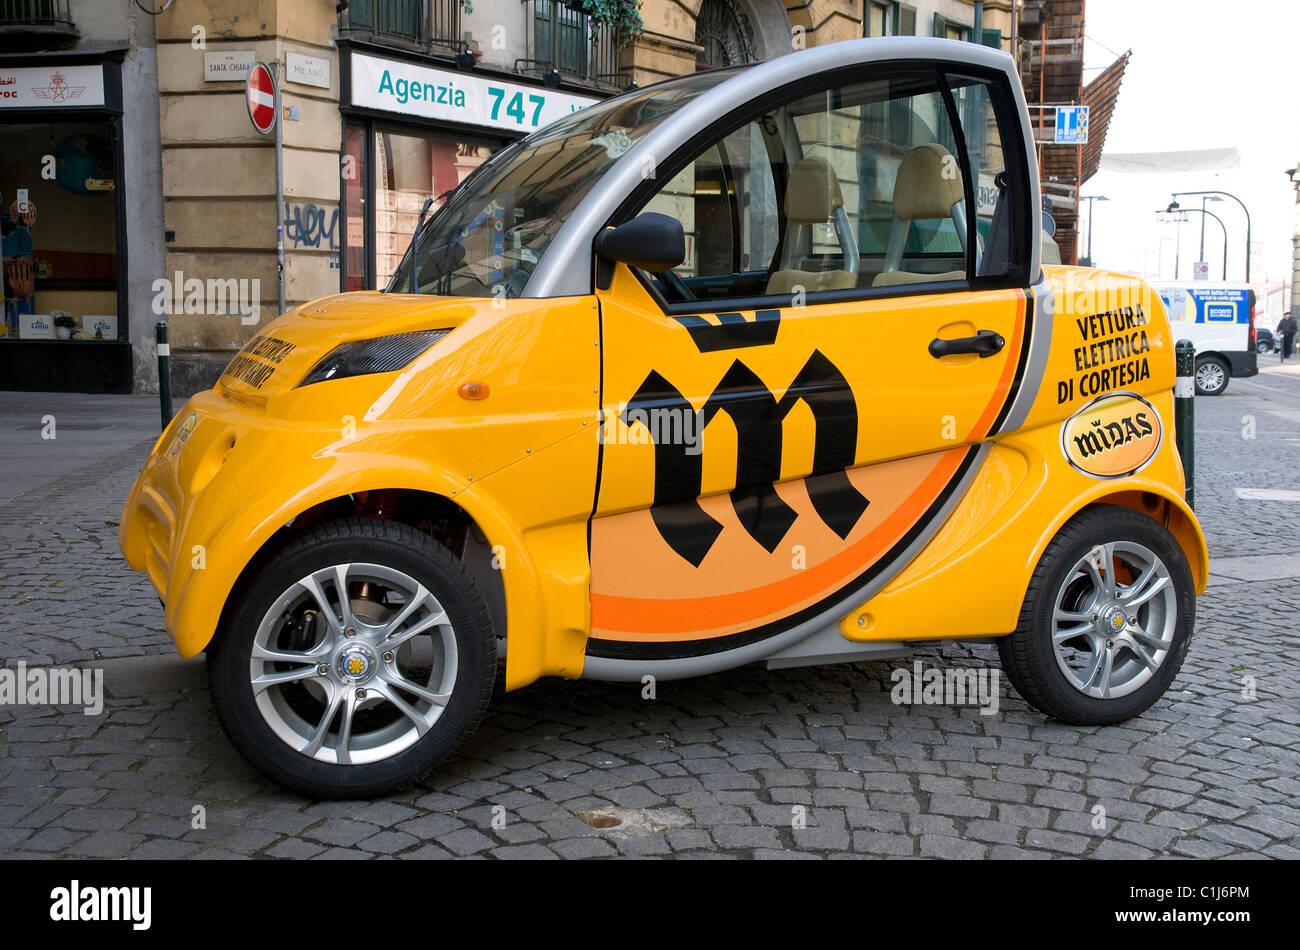 midas electric car, turin, italy - Stock Image